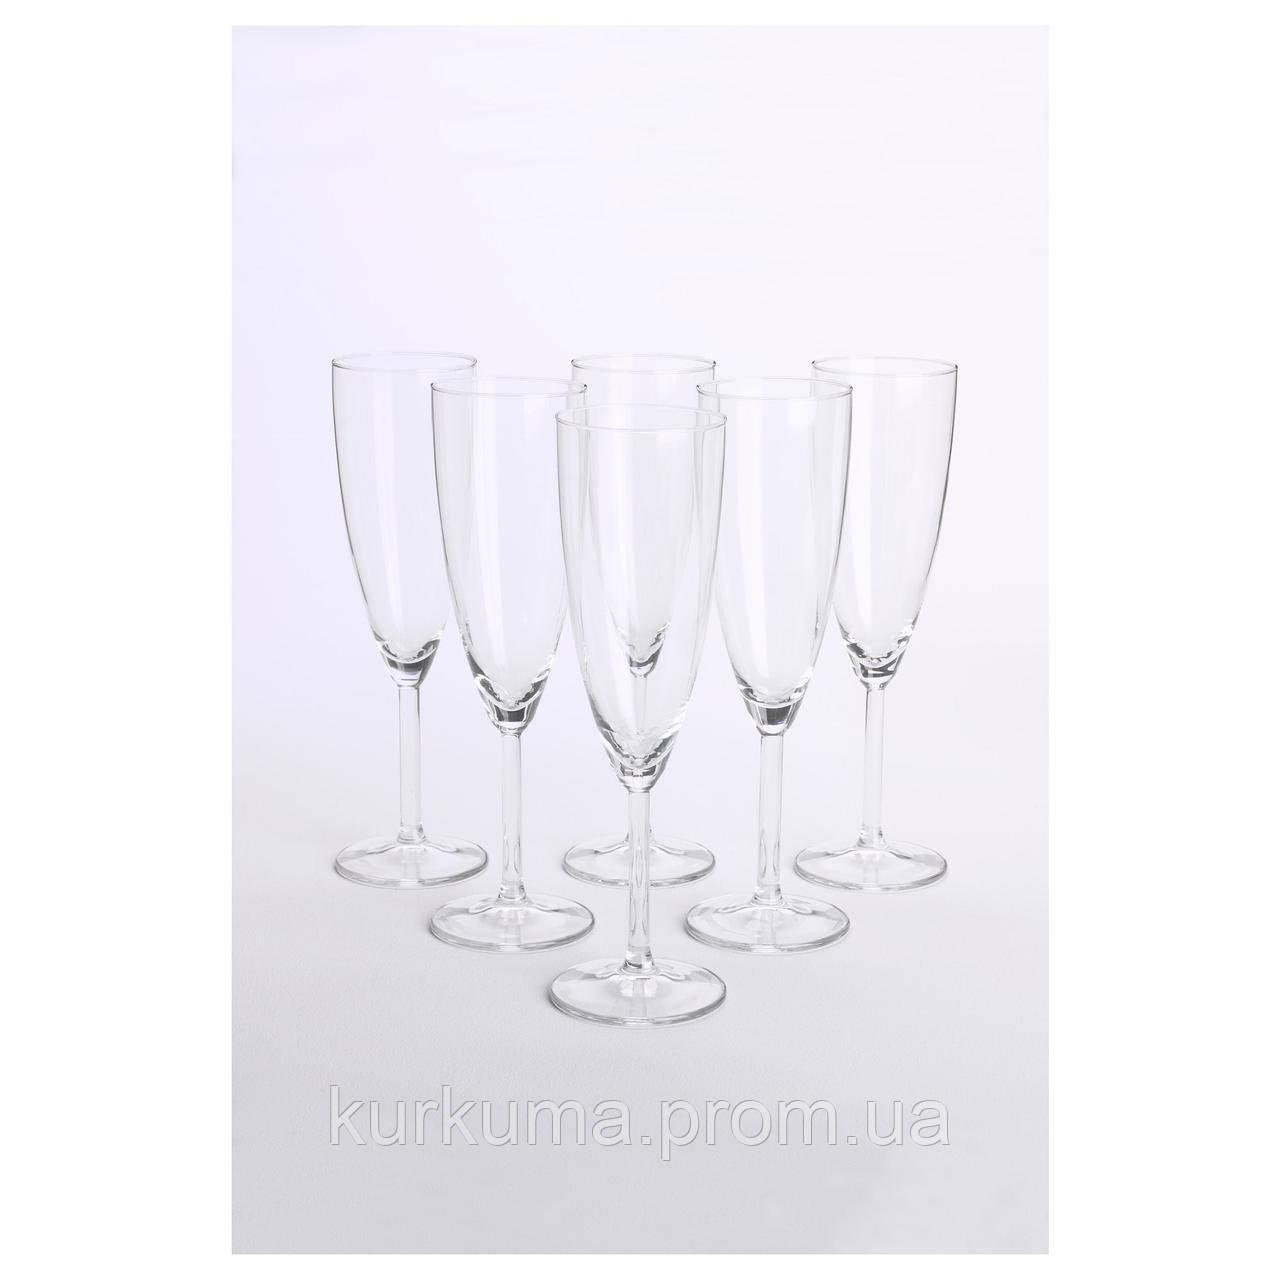 IKEA SVALKA Бокал для шампанского, прозрачный  (500.151.22)